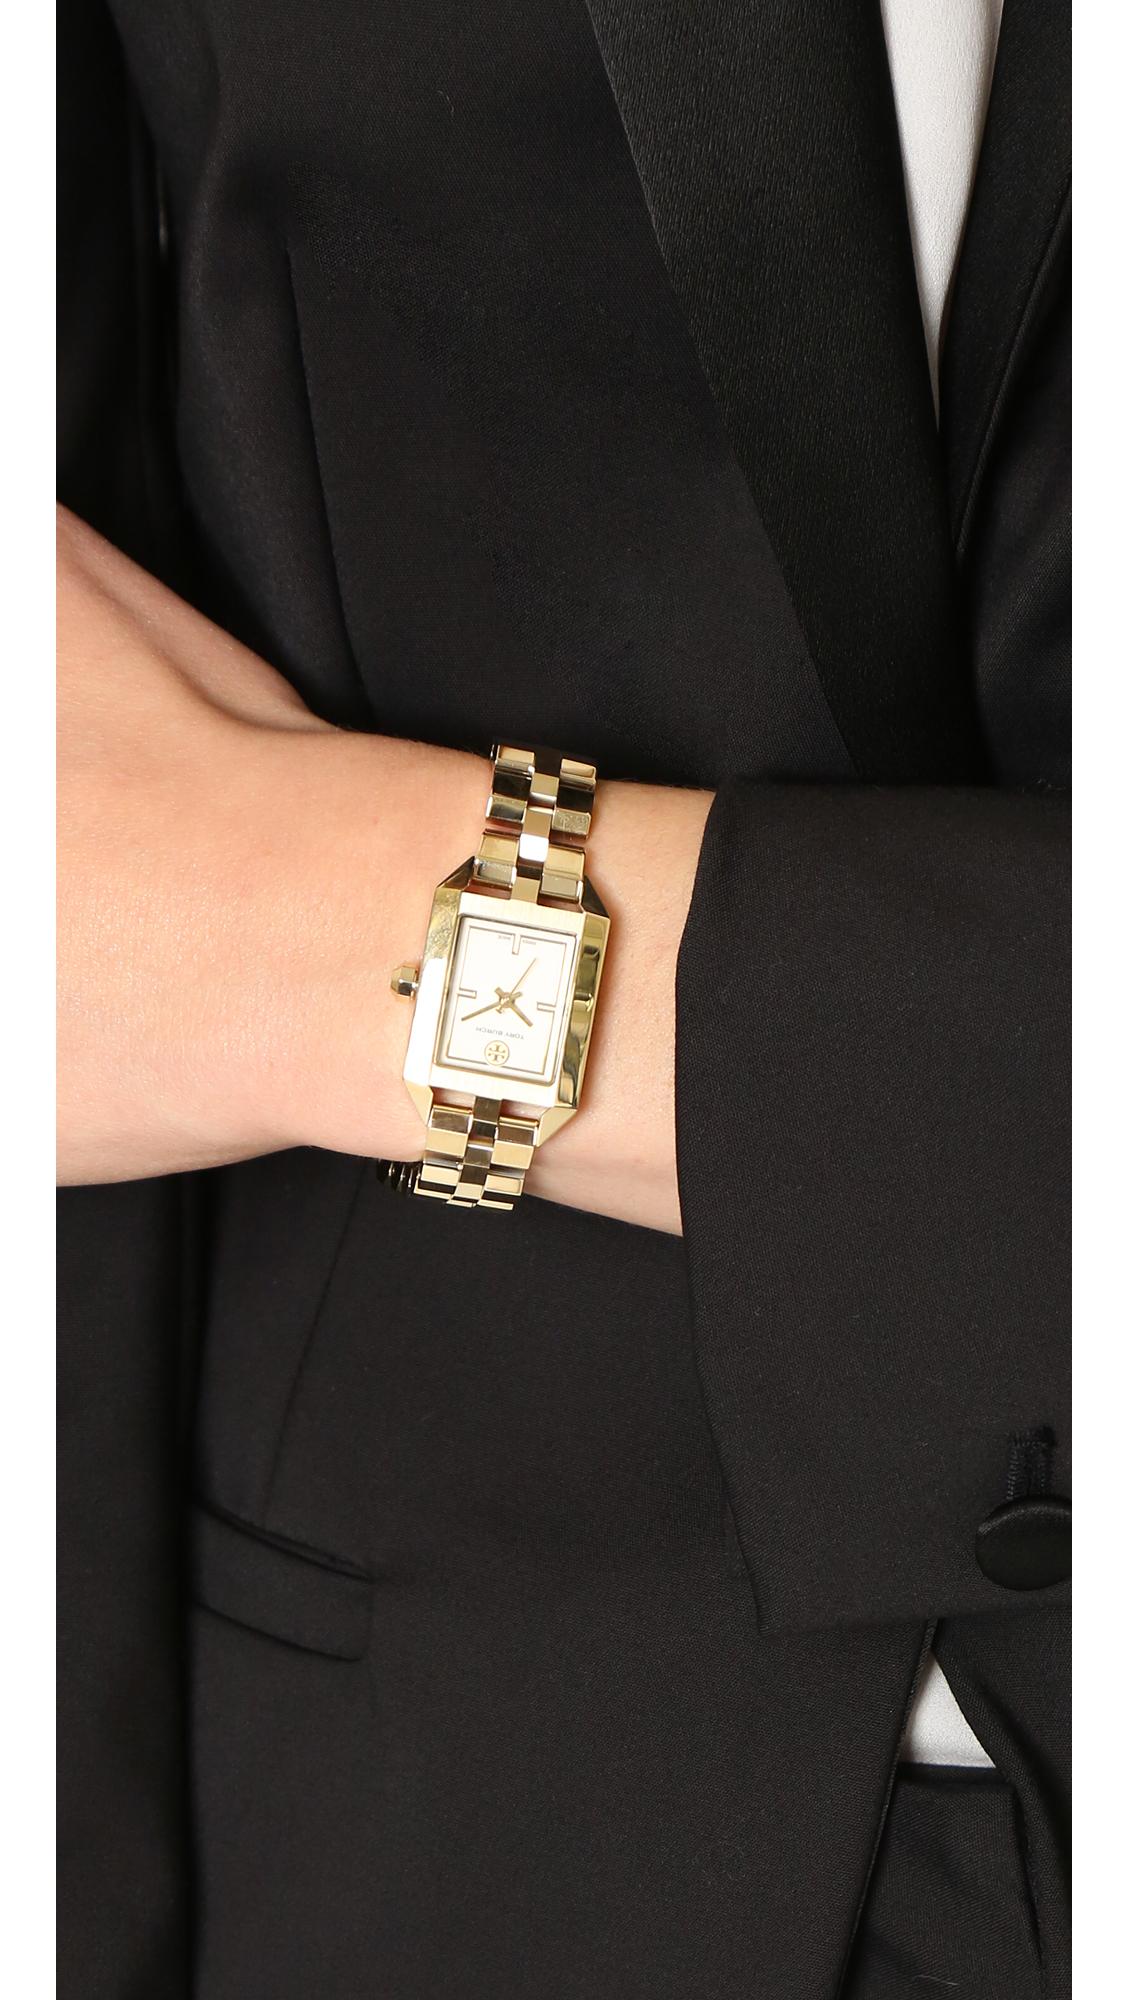 ff81d18bf59 Tory Burch Dalloway Watch in Metallic - Lyst